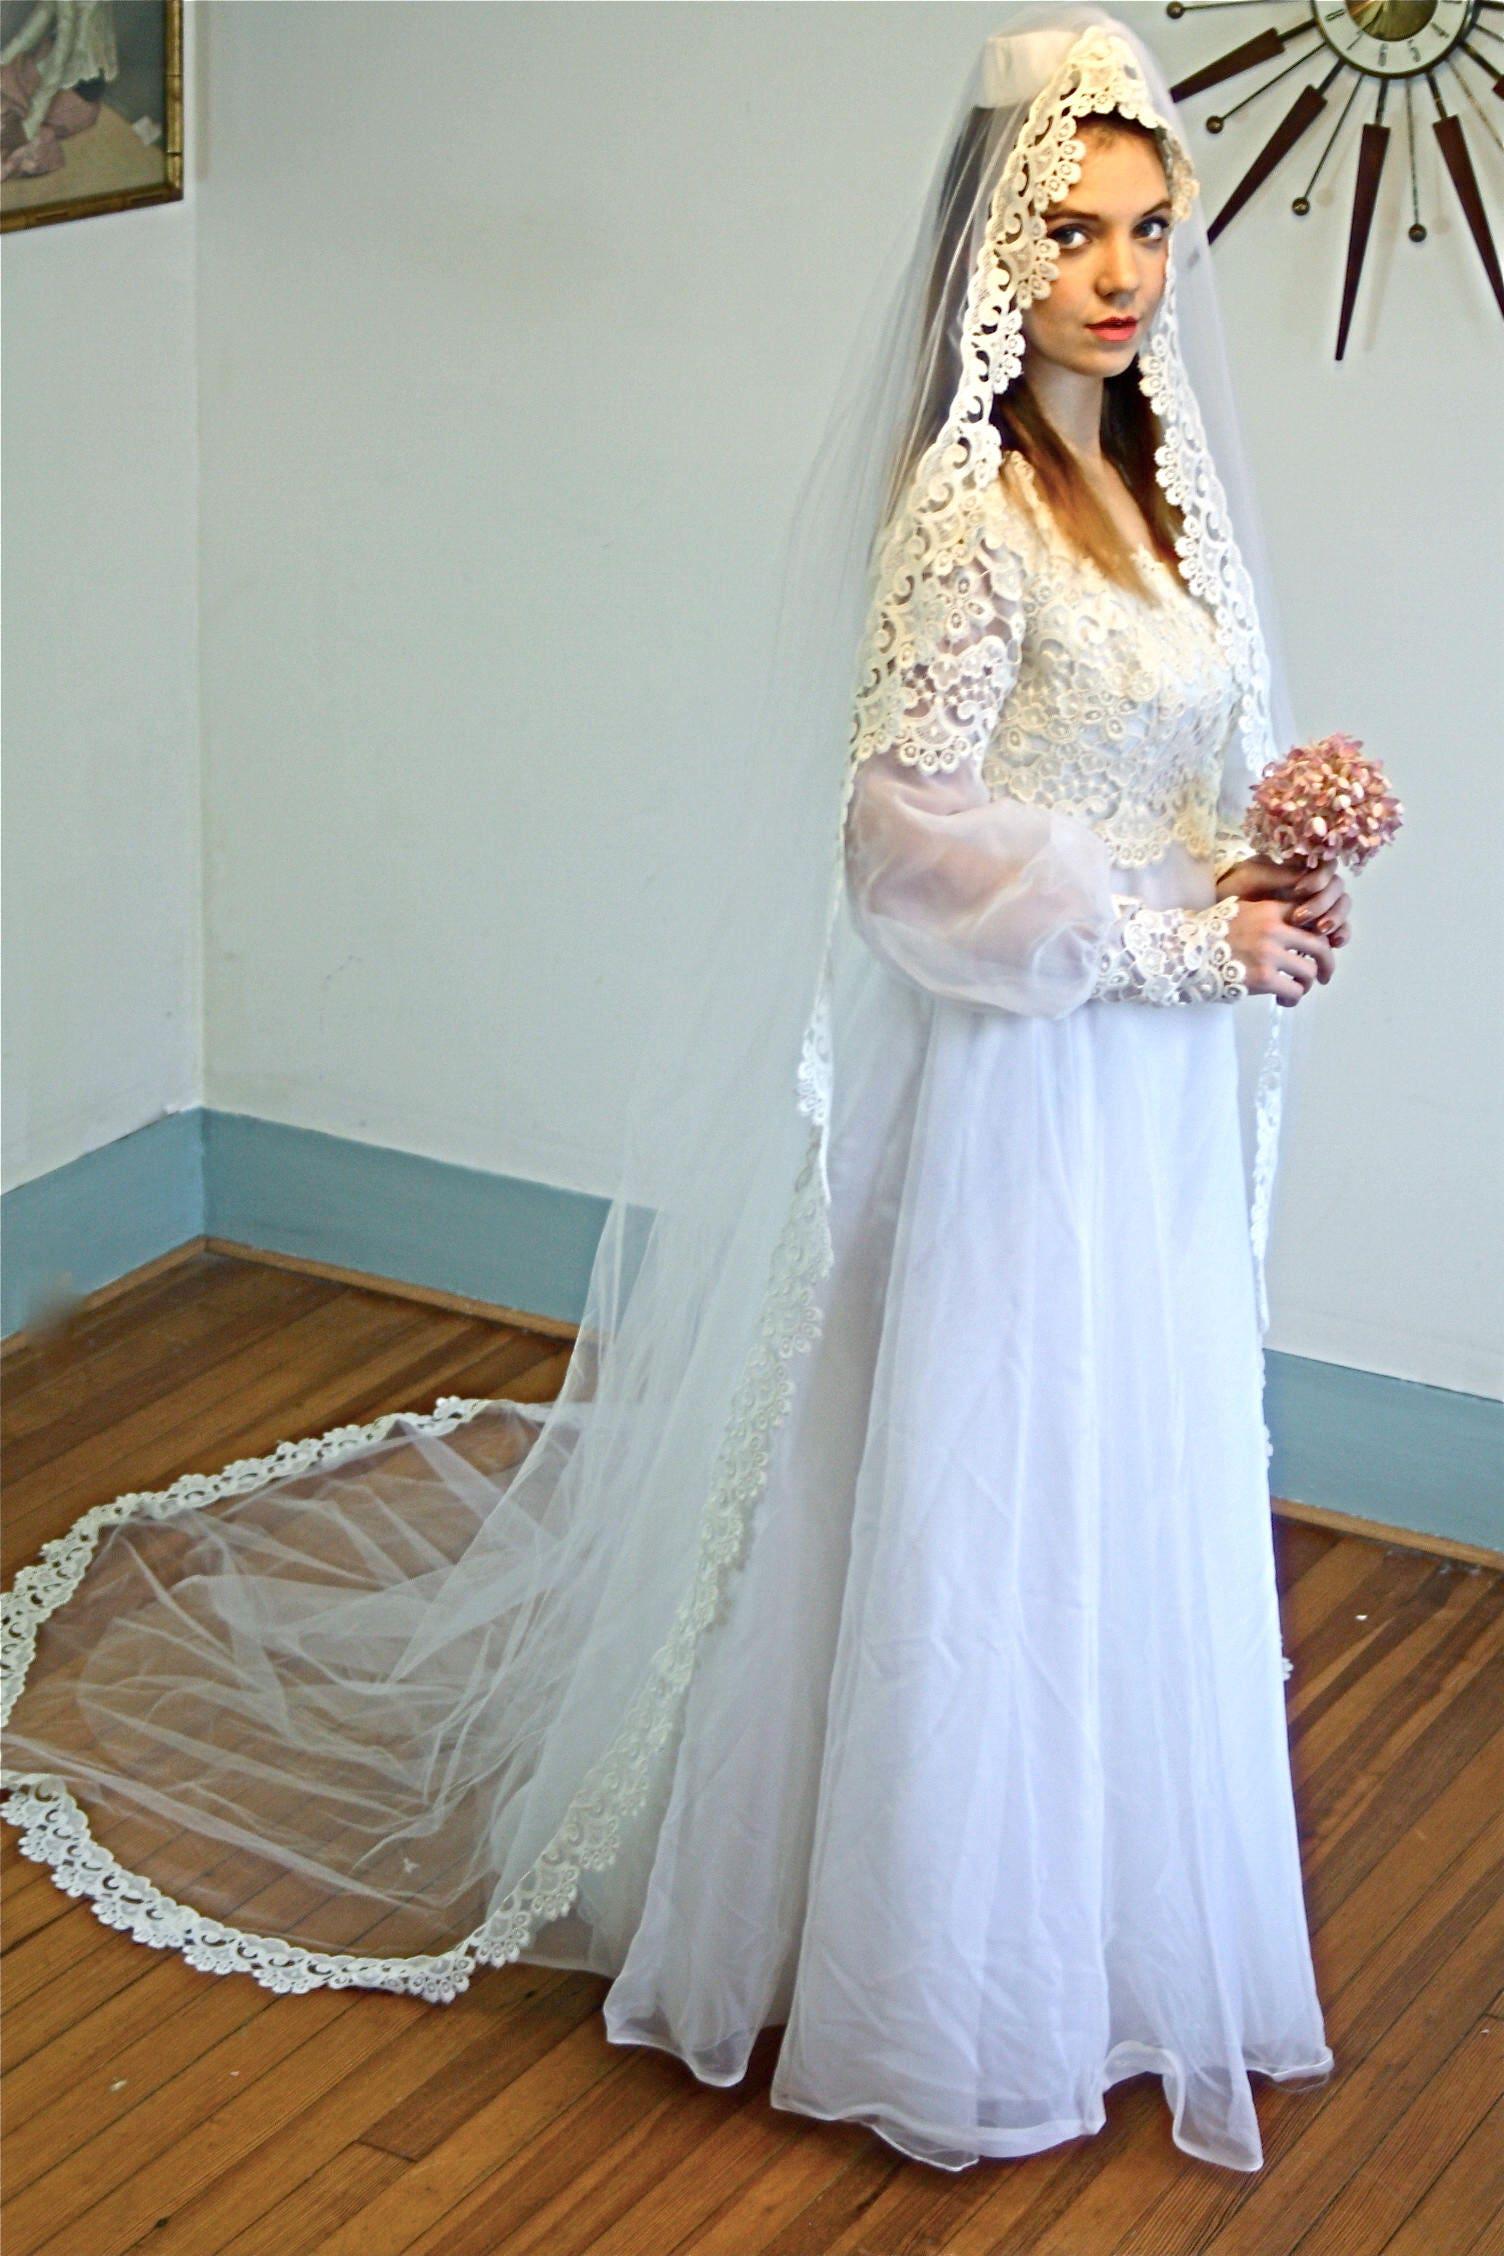 70s Wedding Dress, Lace Veil Dress Set, Vintage Chantilly Lace ...